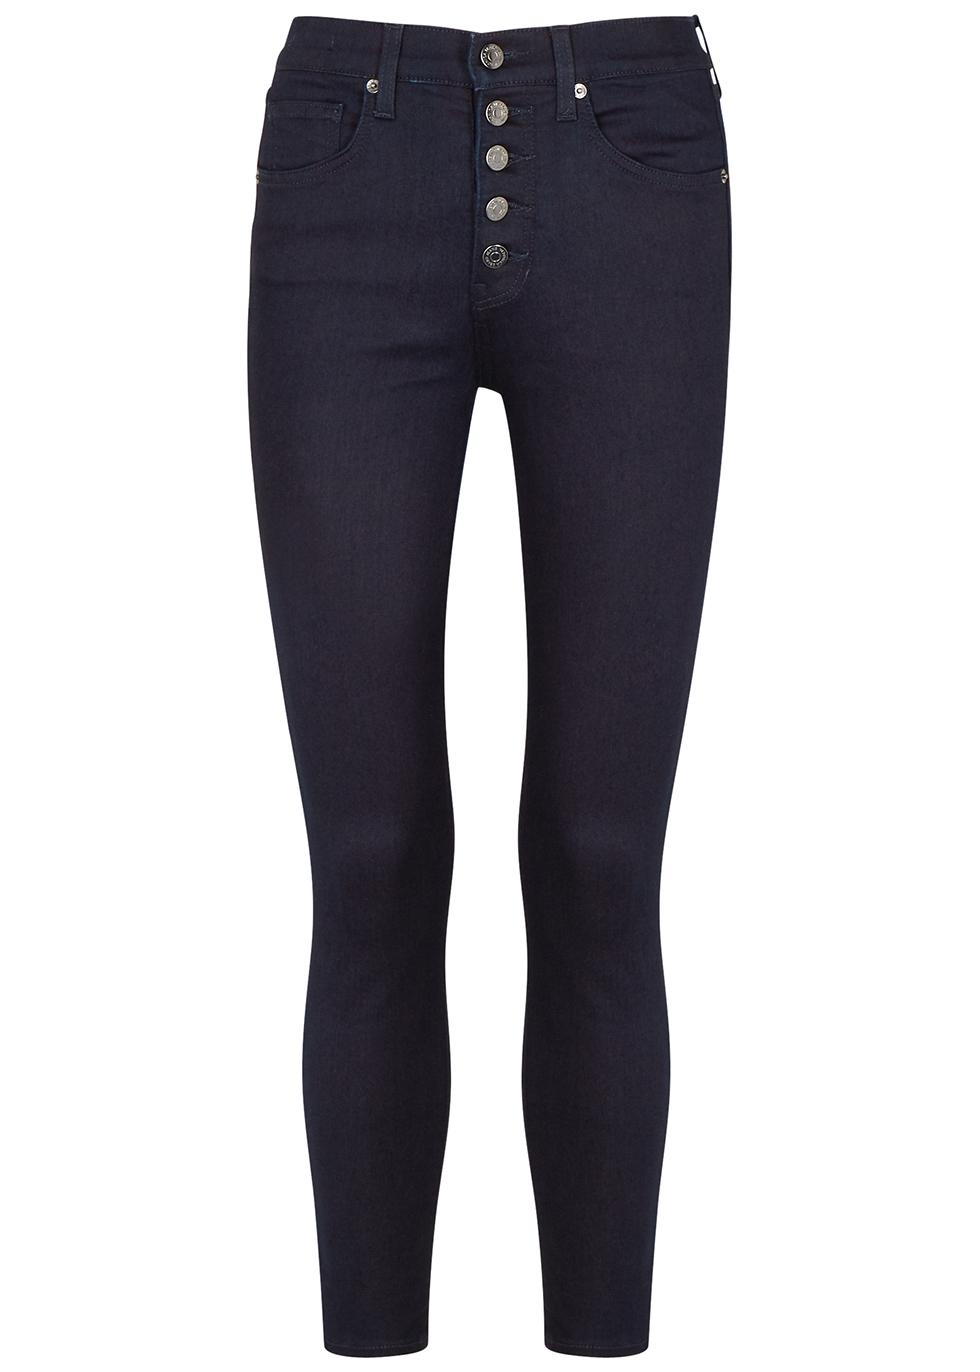 Debbie indigo skinny jeans